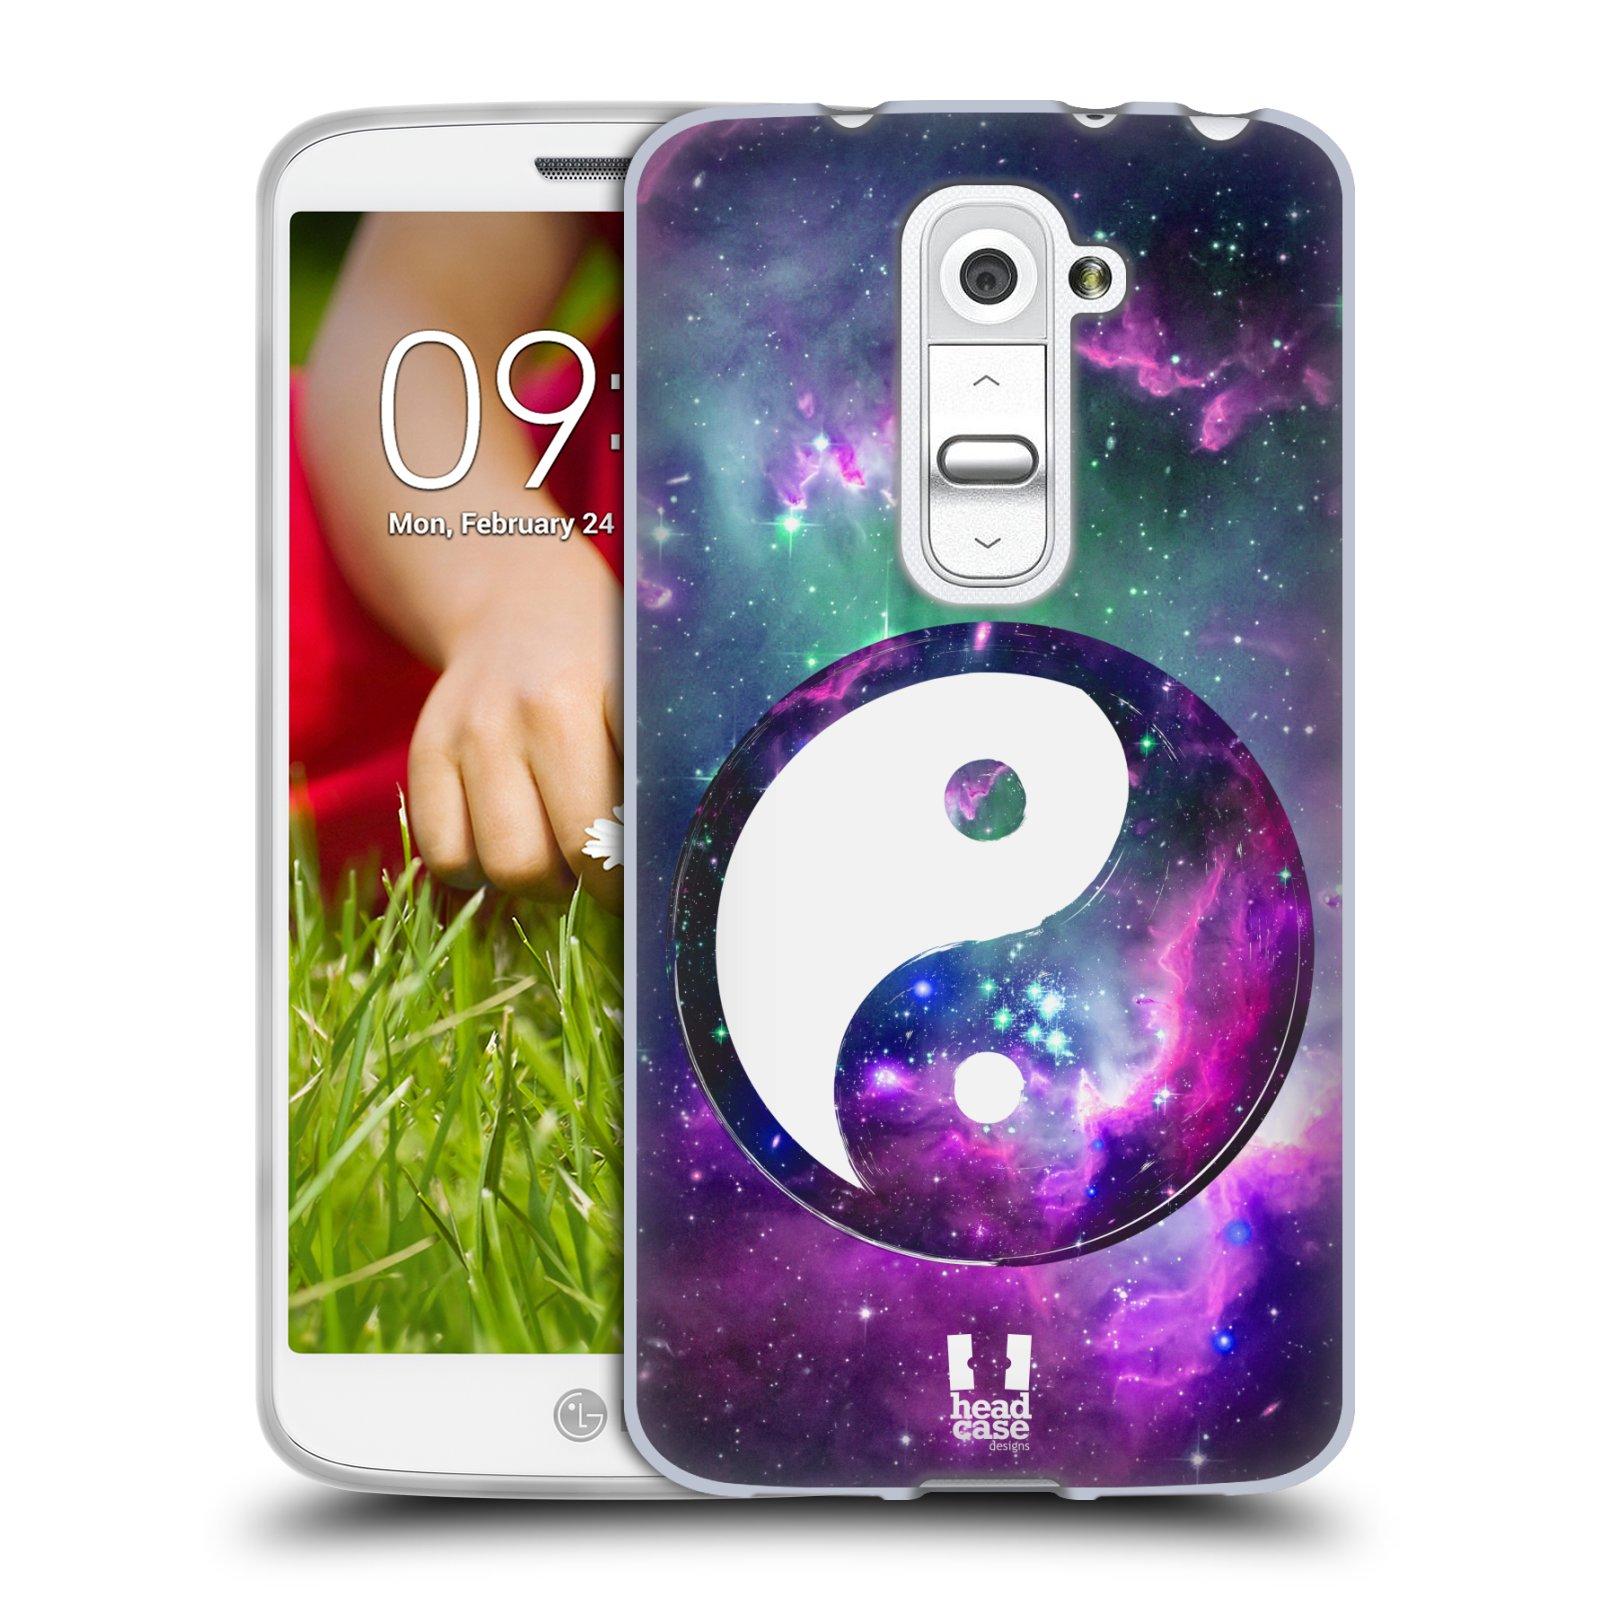 Silikonové pouzdro na mobil LG G2 Mini HEAD CASE YIn a Yang PURPLE (Silikonový kryt či obal na mobilní telefon LG G2 Mini D620)